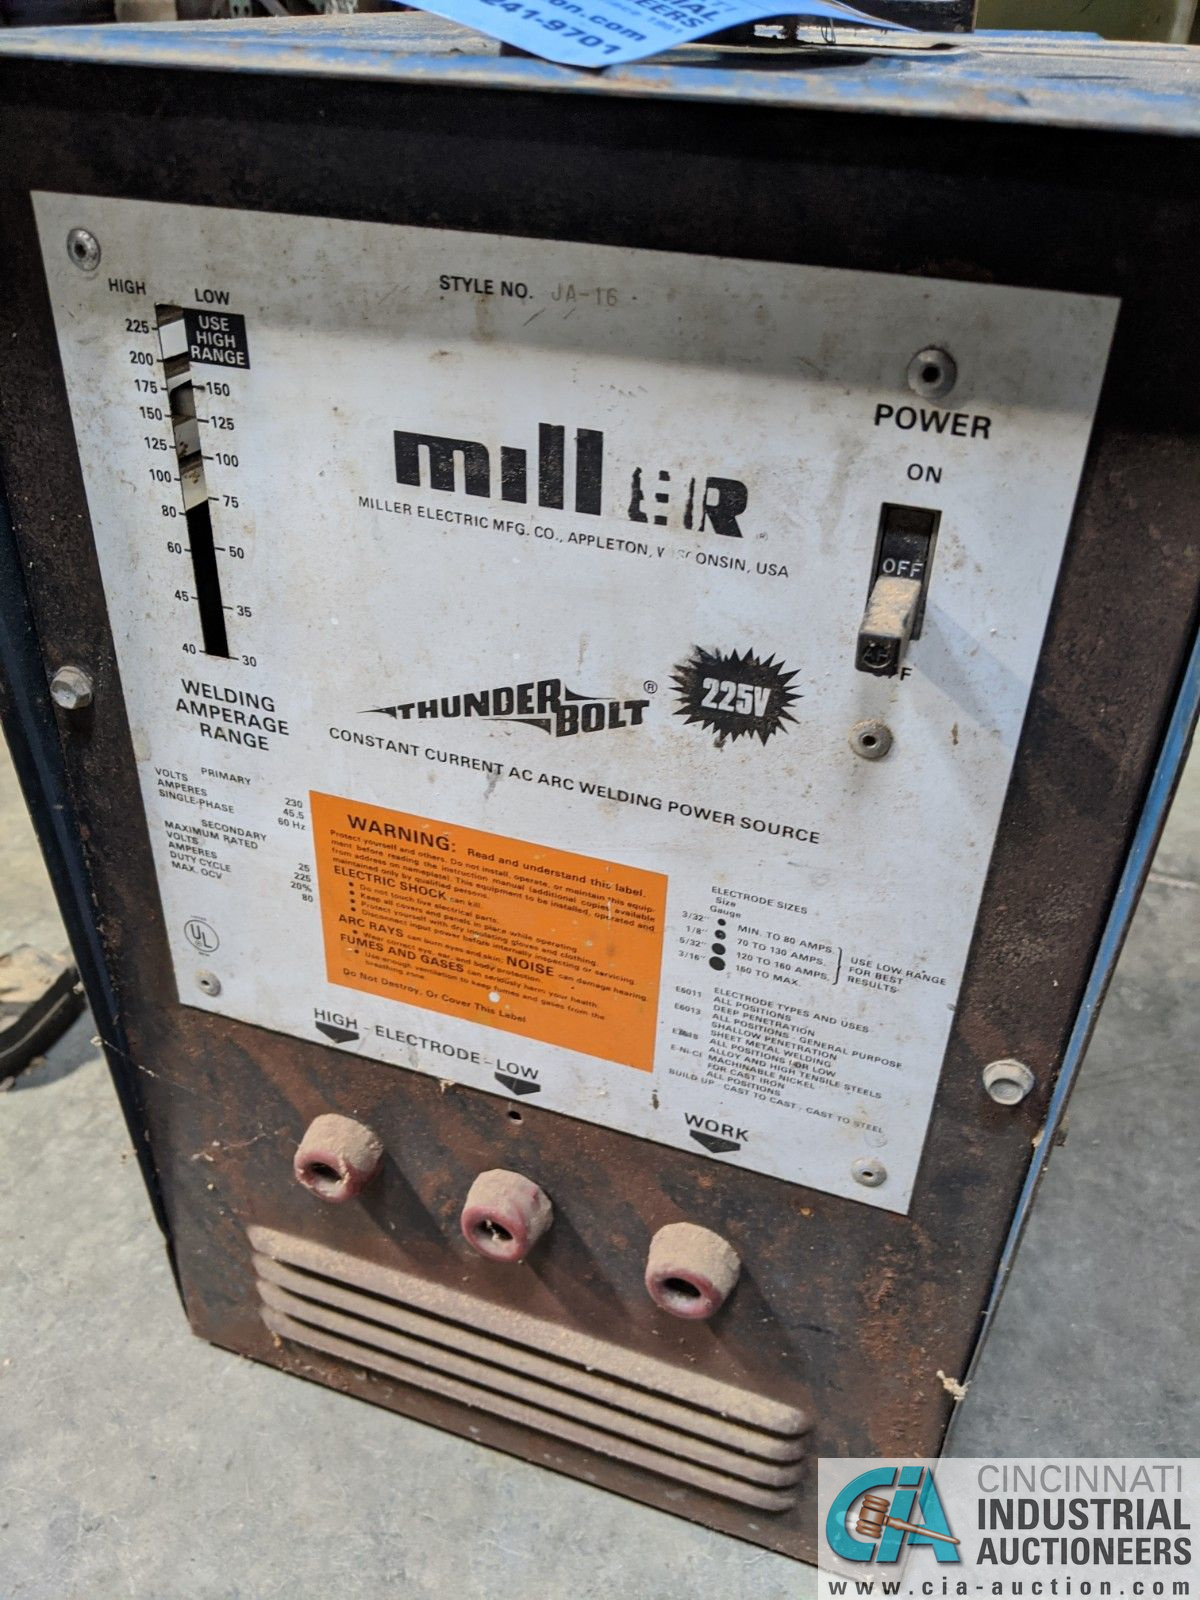 45 AMP MILLER THUNDERBOLT WELD POWER SOURCE (8635 East Ave., Mentor, OH 44060 - John Magnasum: 440- - Image 2 of 3